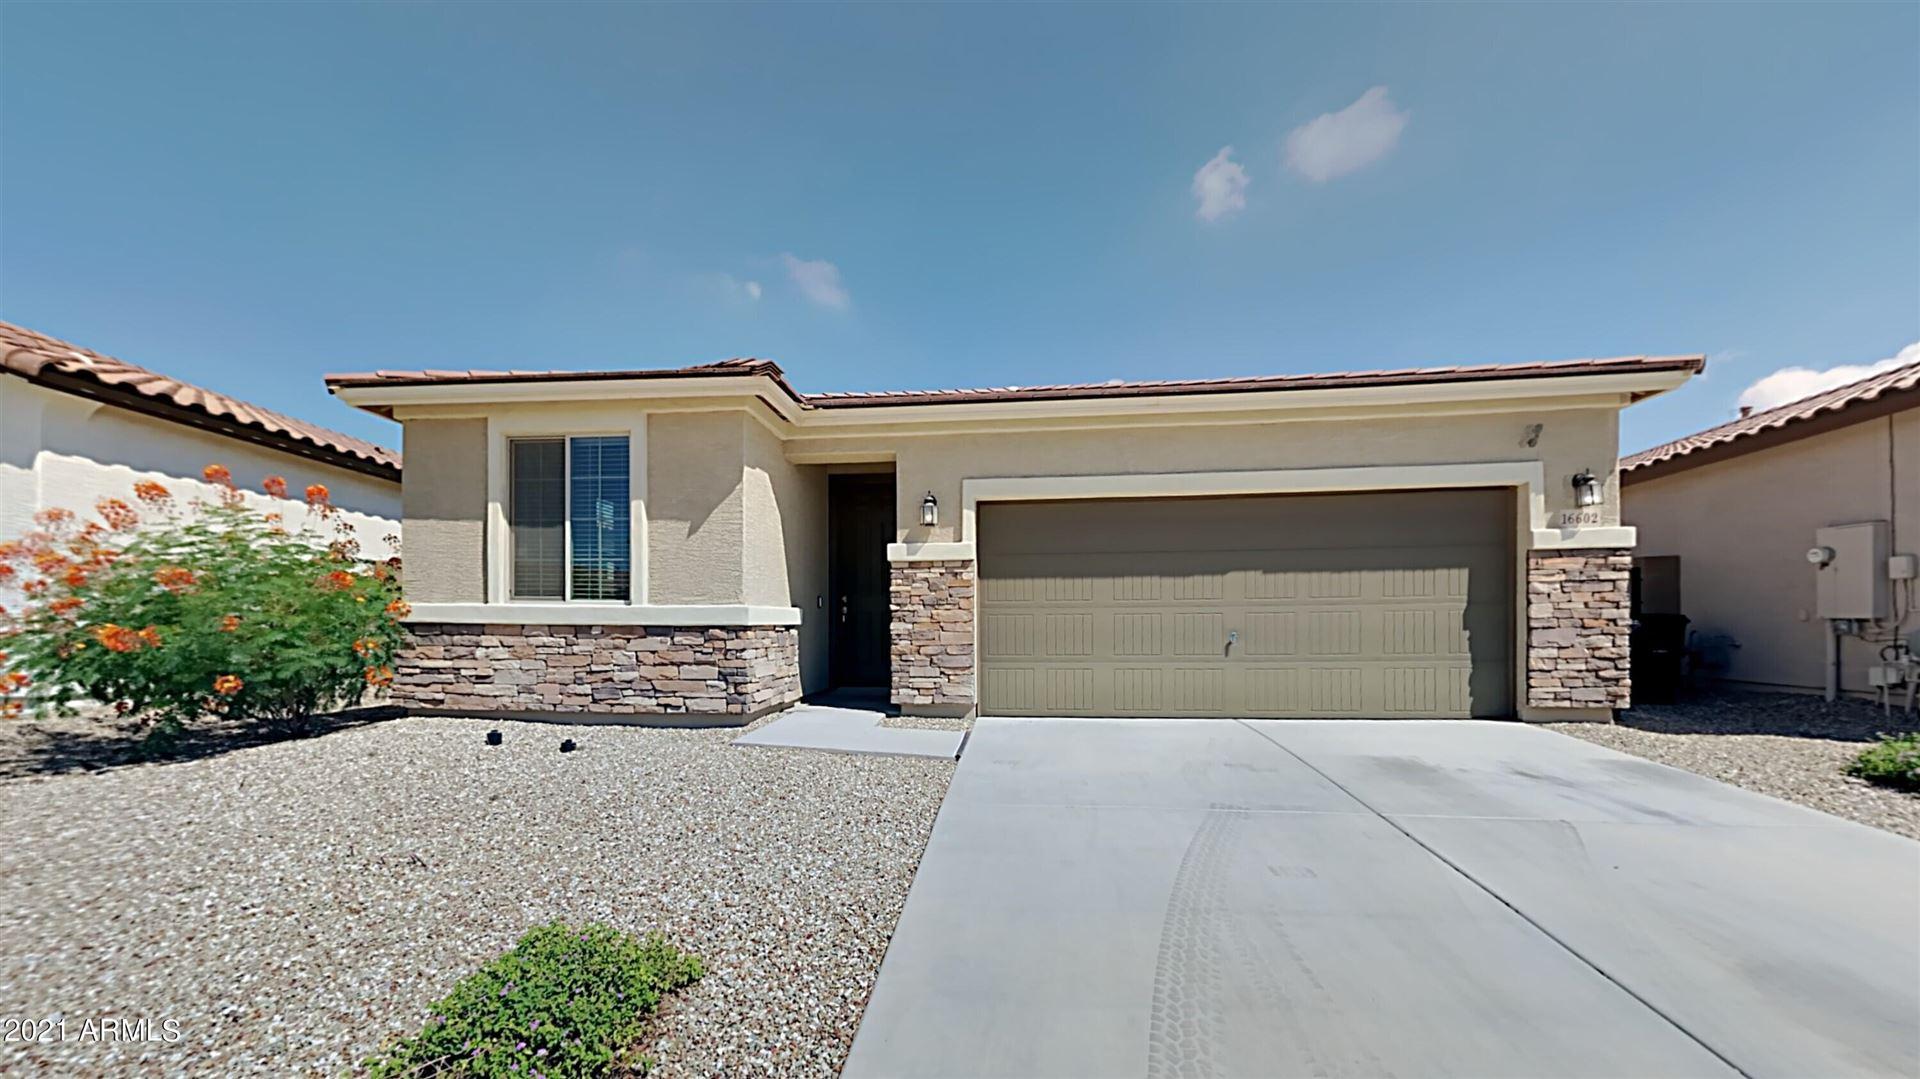 16602 W SHANGRI LA Road, Surprise, AZ 85388 - MLS#: 6290511